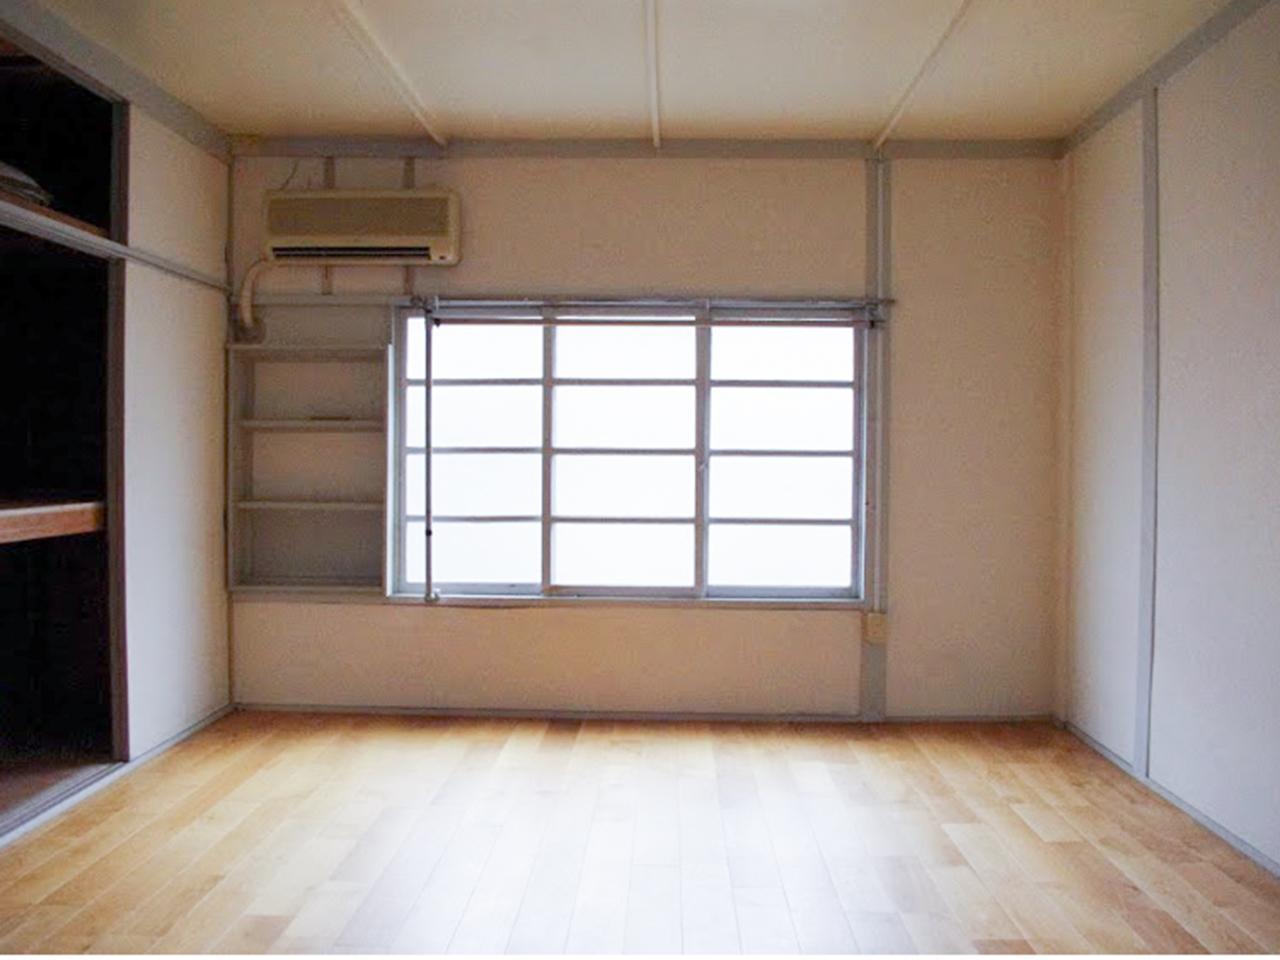 2F洋室は無垢フローリング(前回募集時の写真です)